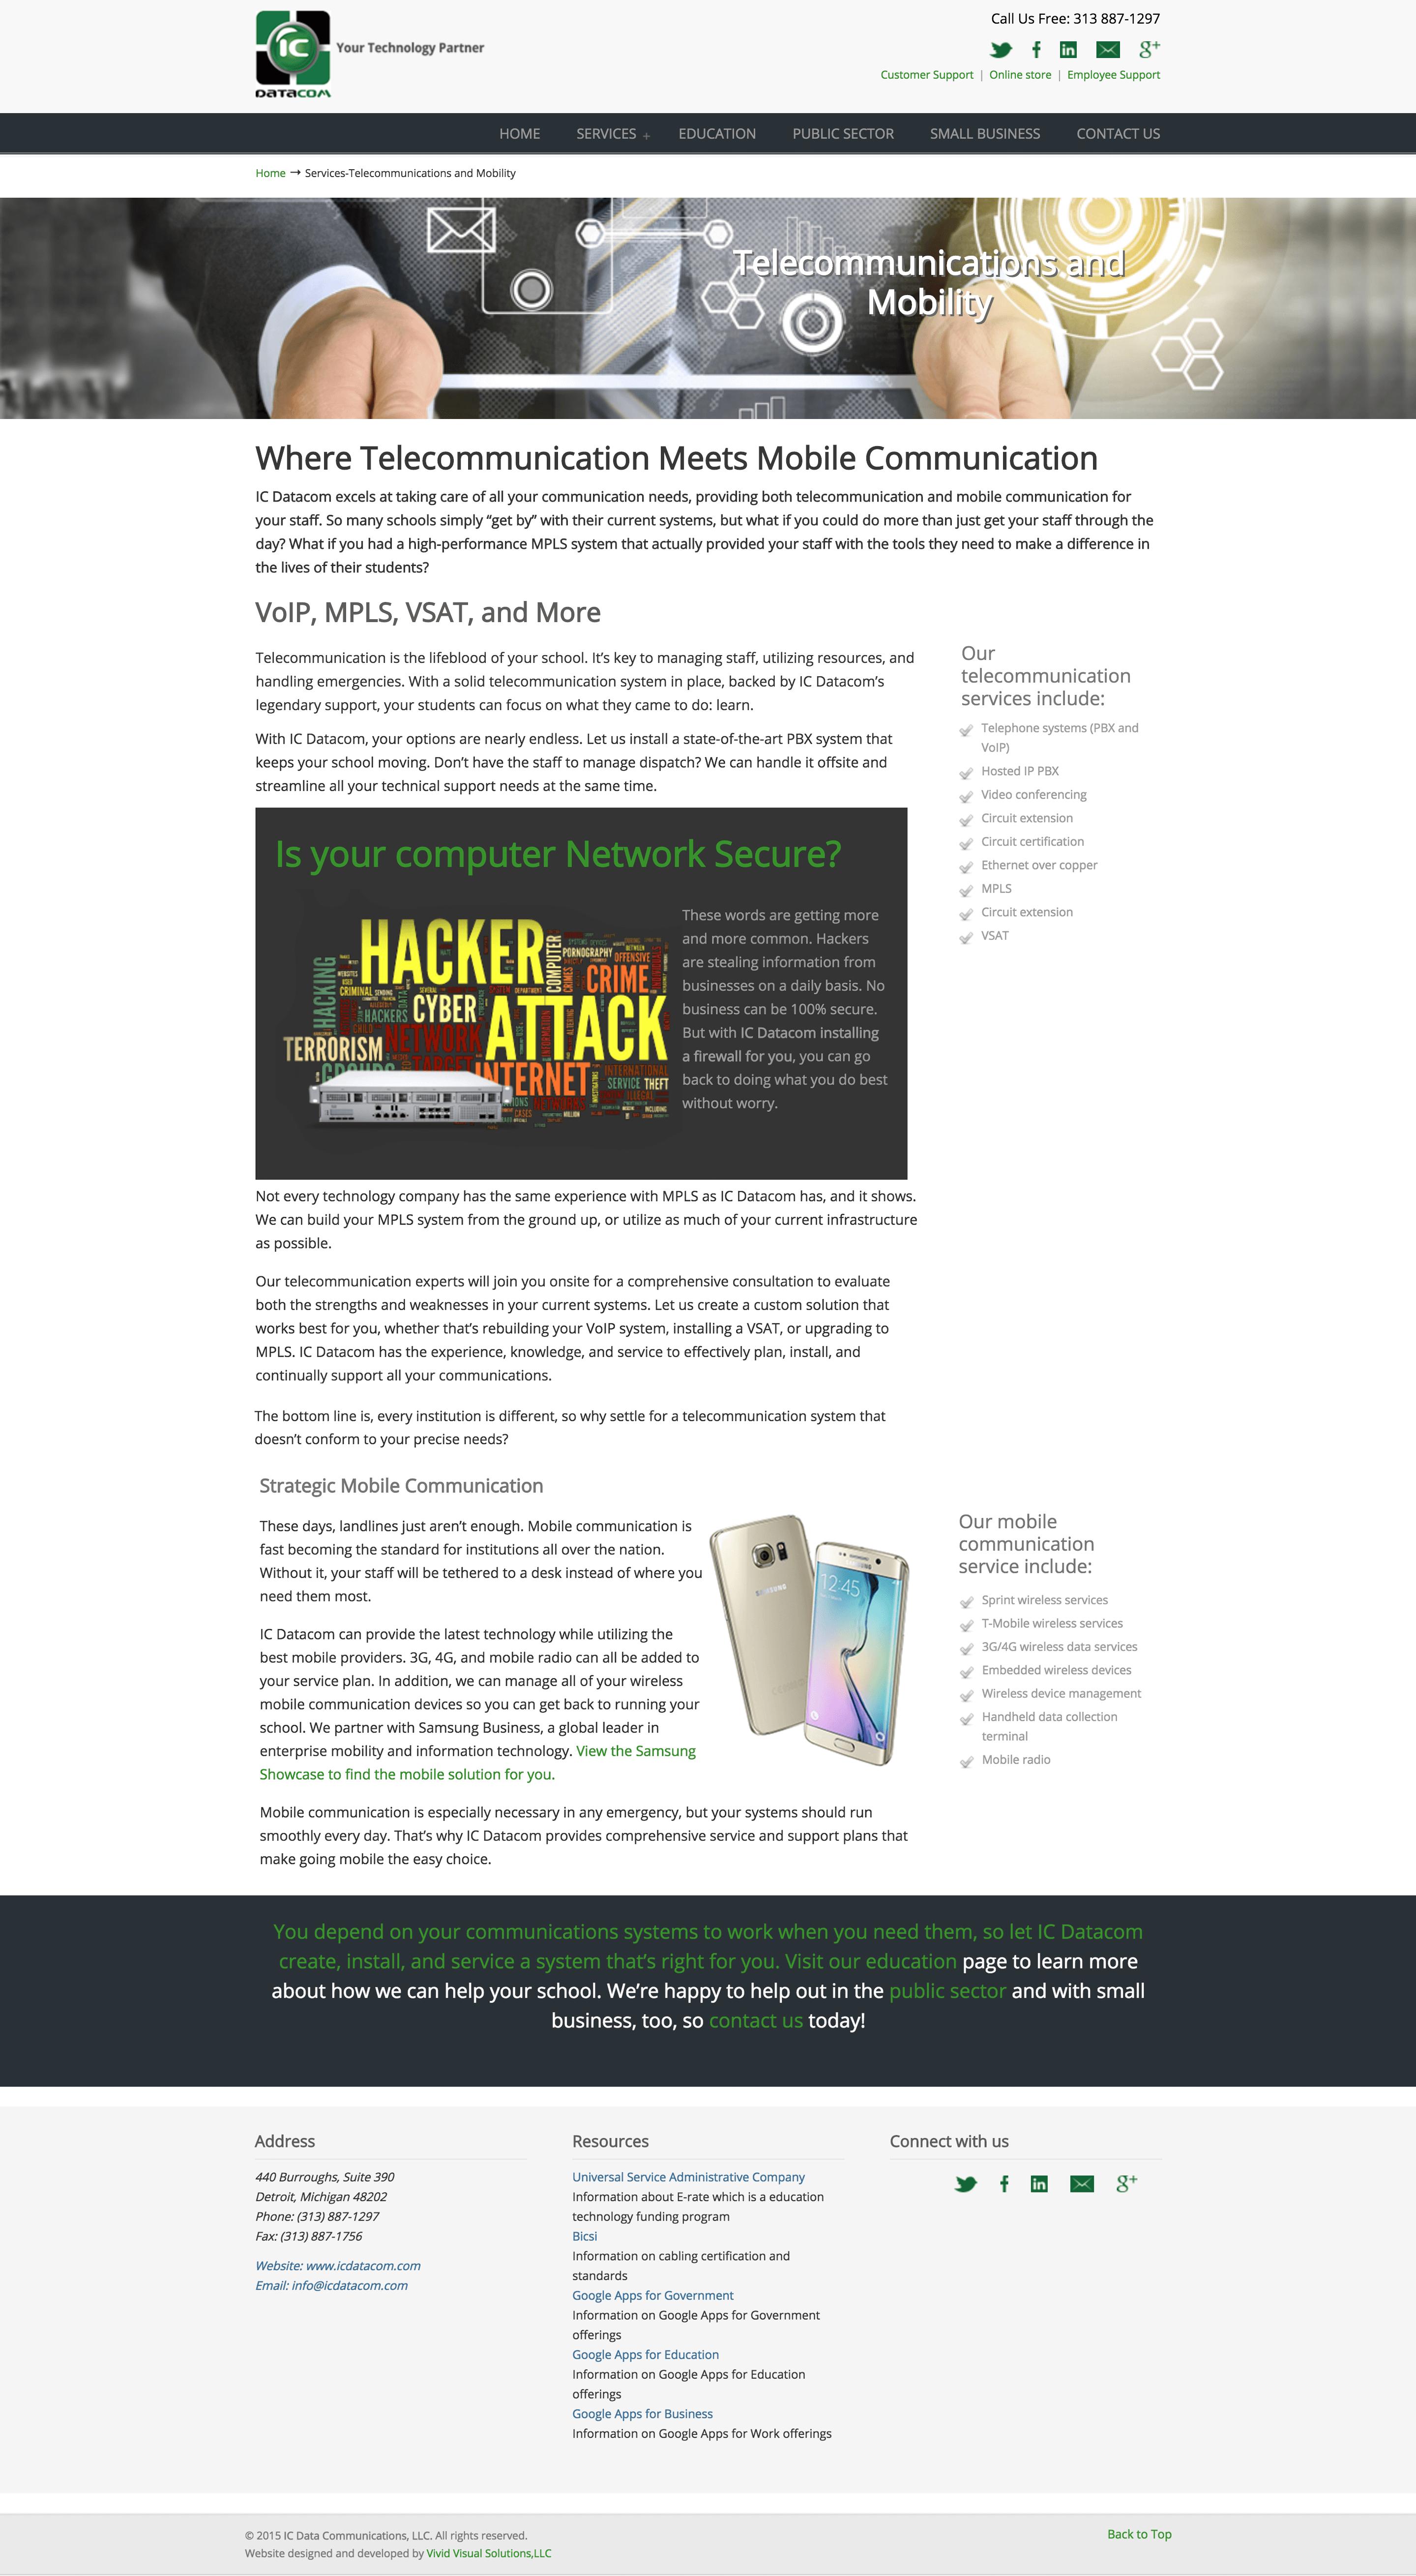 icdatacom-services